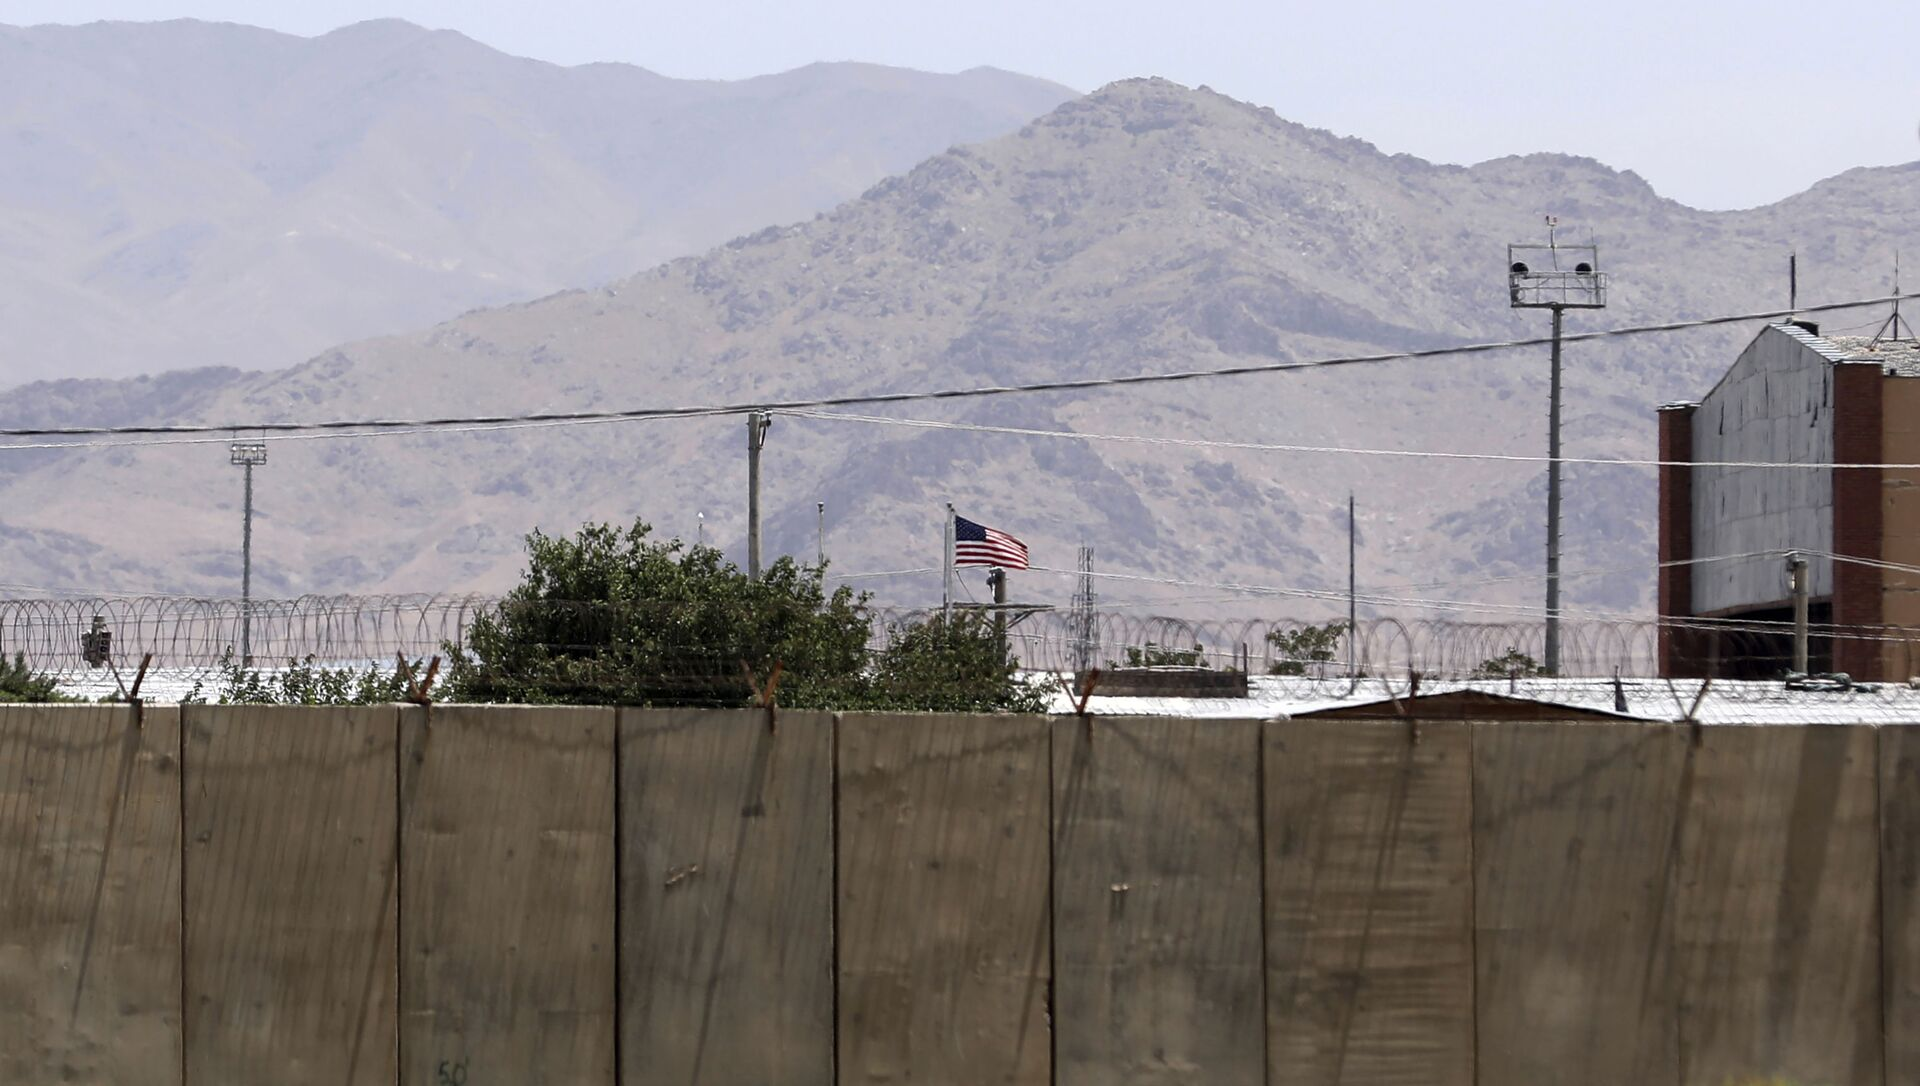 The flag of the United States flies over Bagram Air Base, in Afghanistan, Friday, June 25, 2021. - Sputnik France, 1920, 03.08.2021